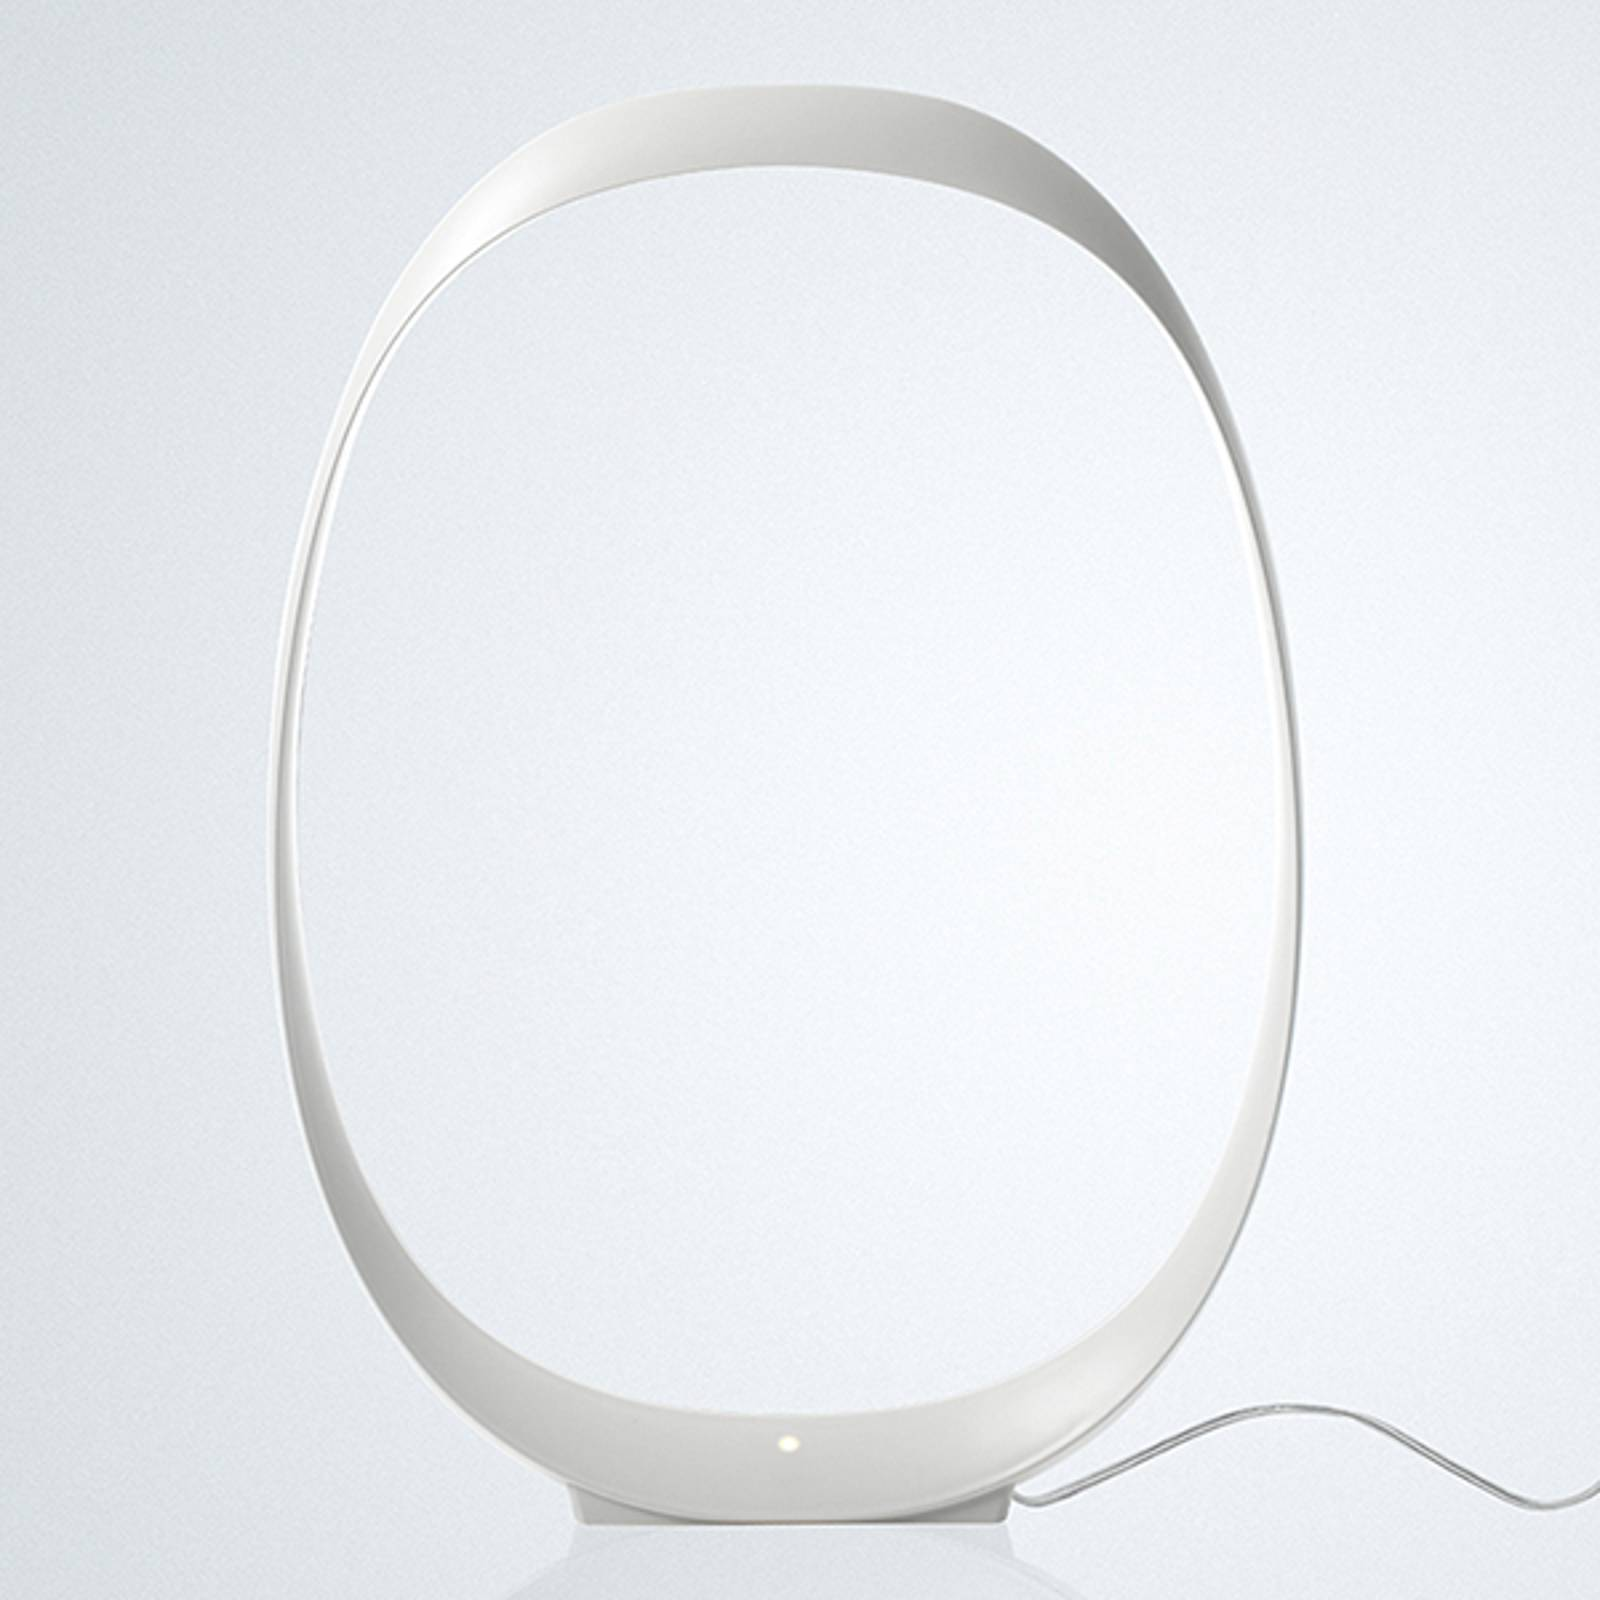 Foscarini Anisha grande LED-Tischleuchte, 46cm